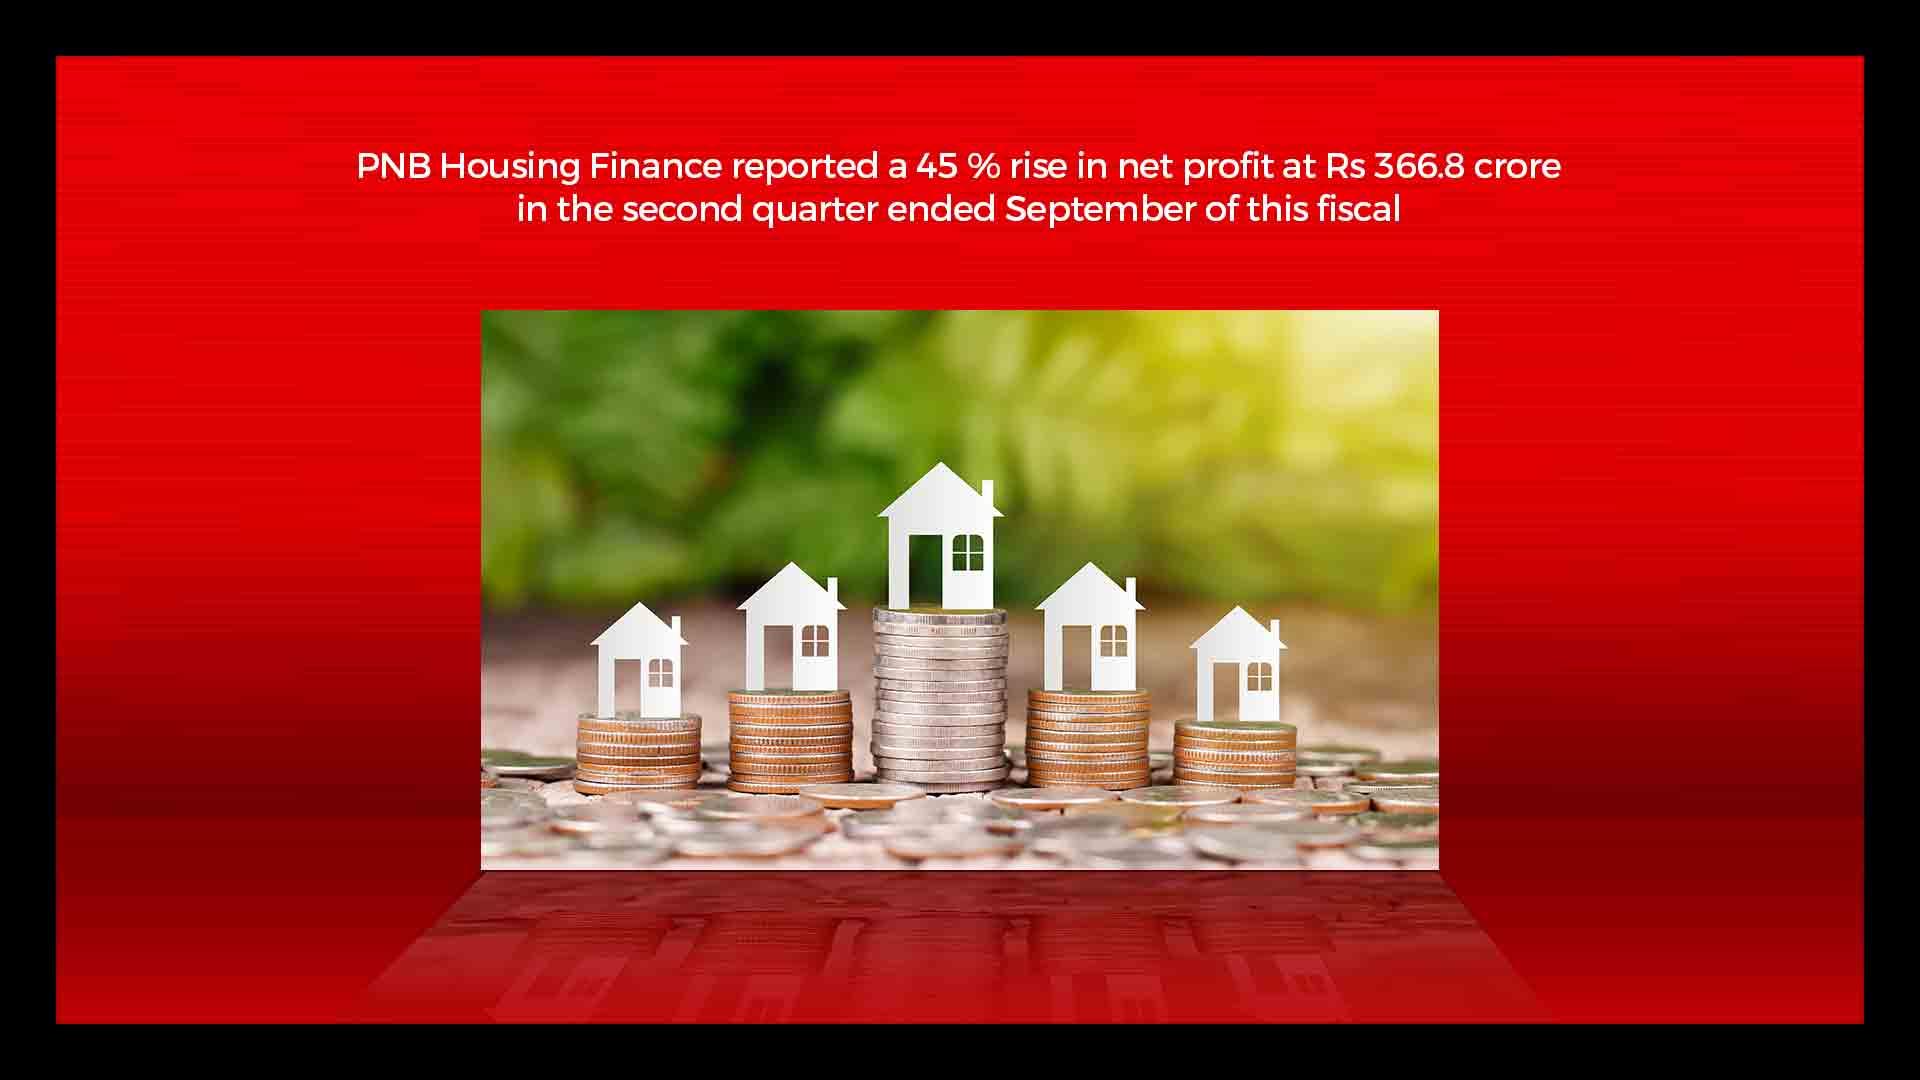 PNB Housing Finance's net profit grows 45% in Q2 FY20